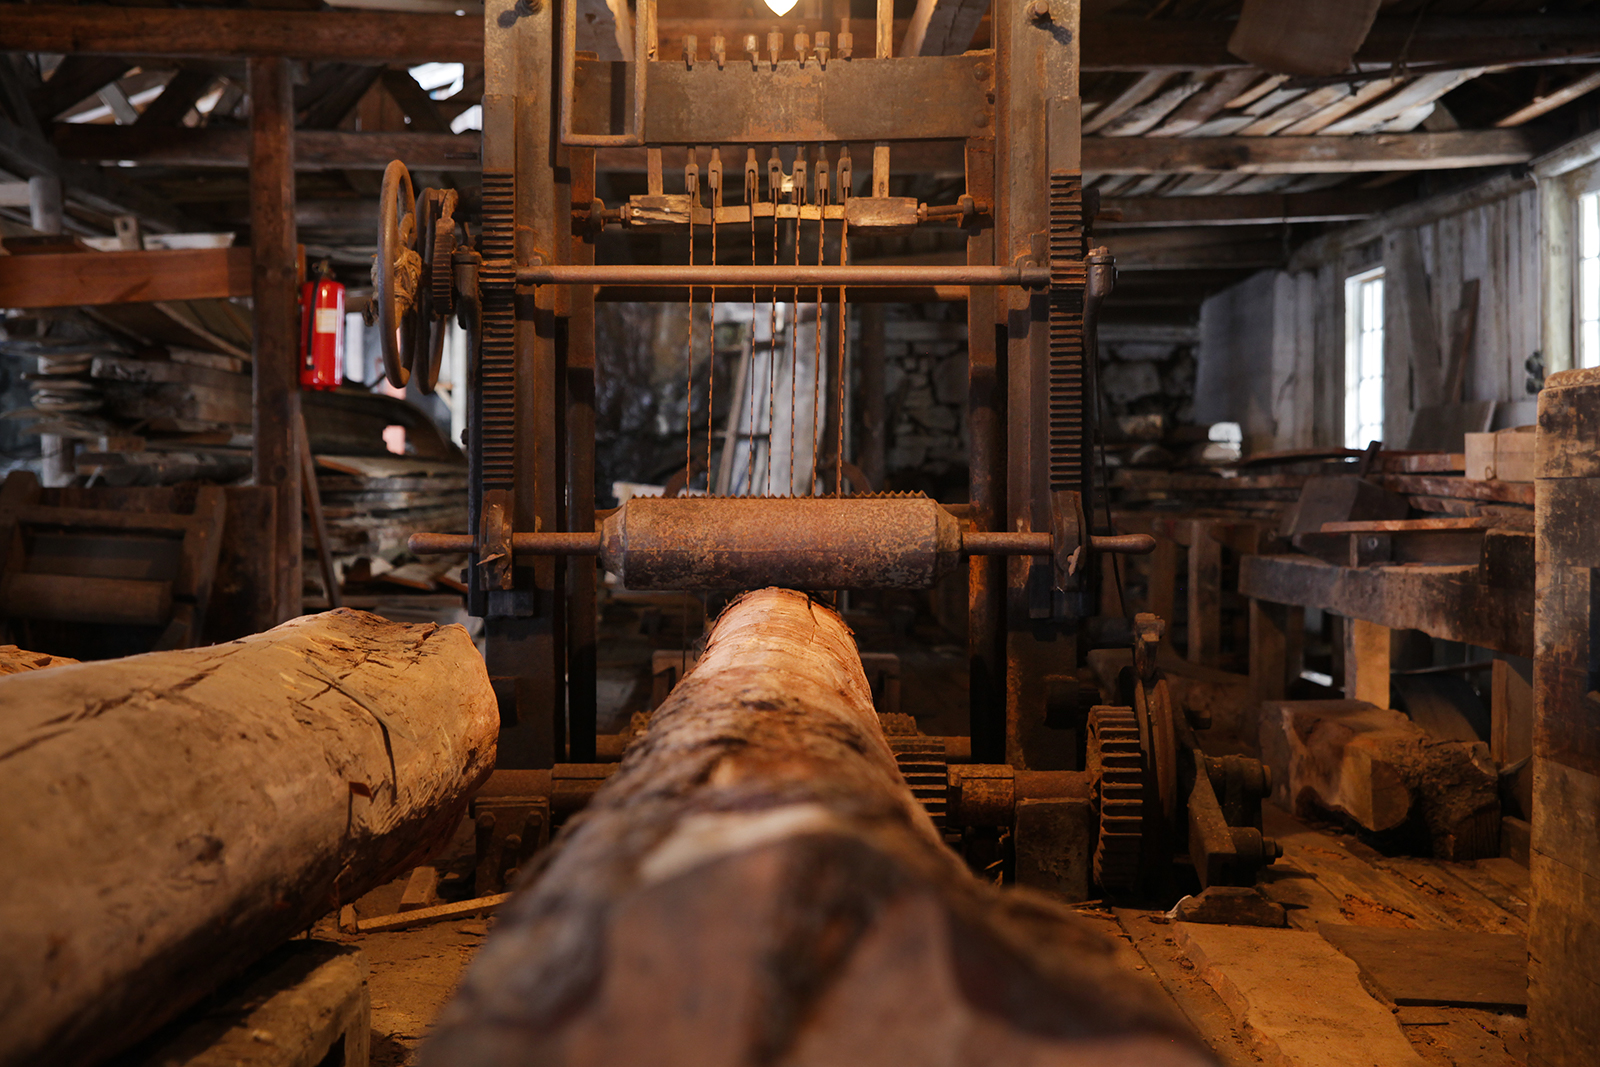 Rammesagen. Sagbruket var ikke det største på Sørlandet, men det som kunne sage de lengste tømmerstokkene, helt opp til 14 meter.